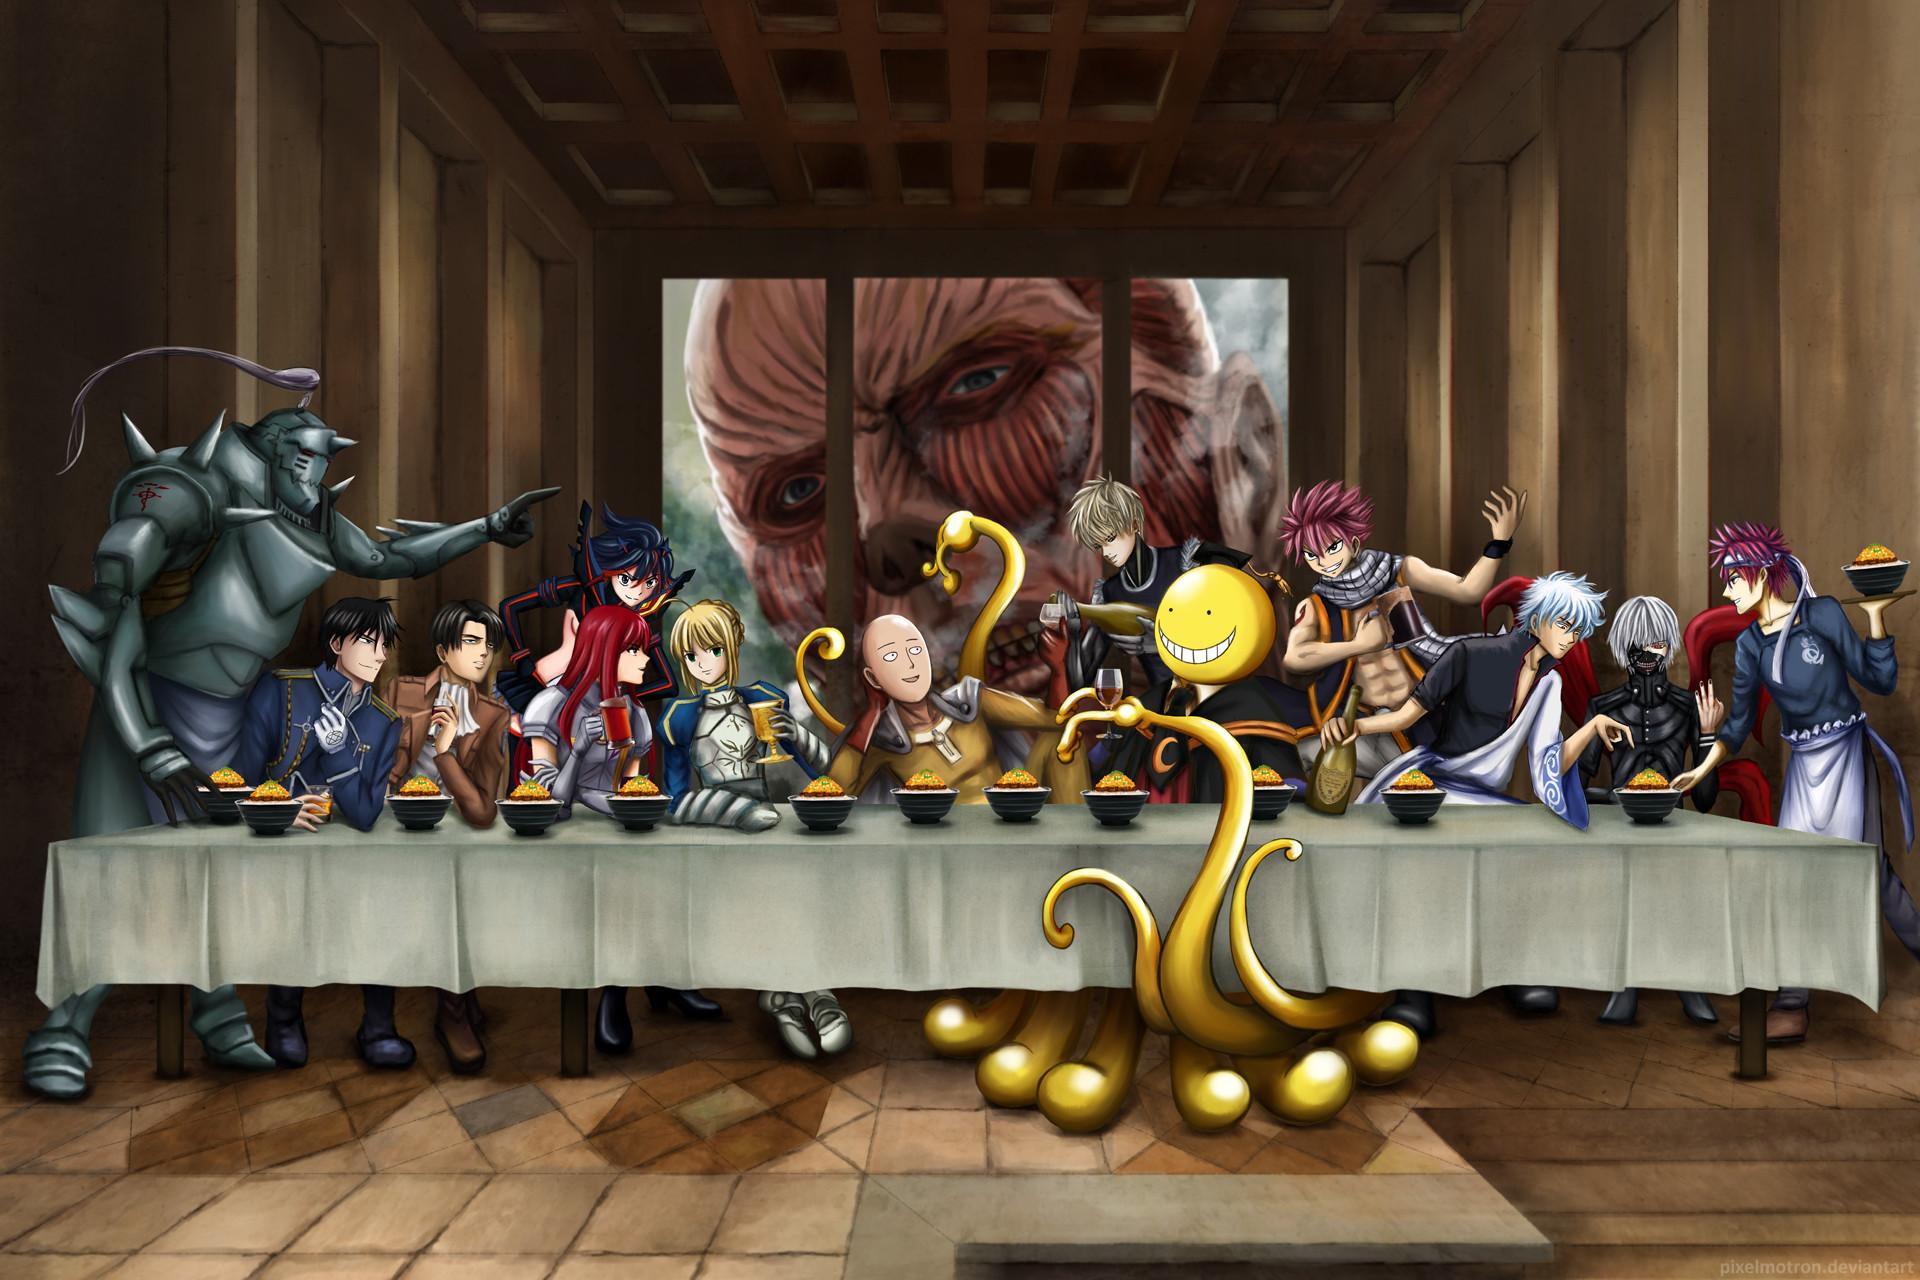 The Last Supper · Anime – Crossover Alphonse Elric Roy Mustang Levi  Ackerman RyÅ«ko Matoi Erza Scarlet Saber (Fate